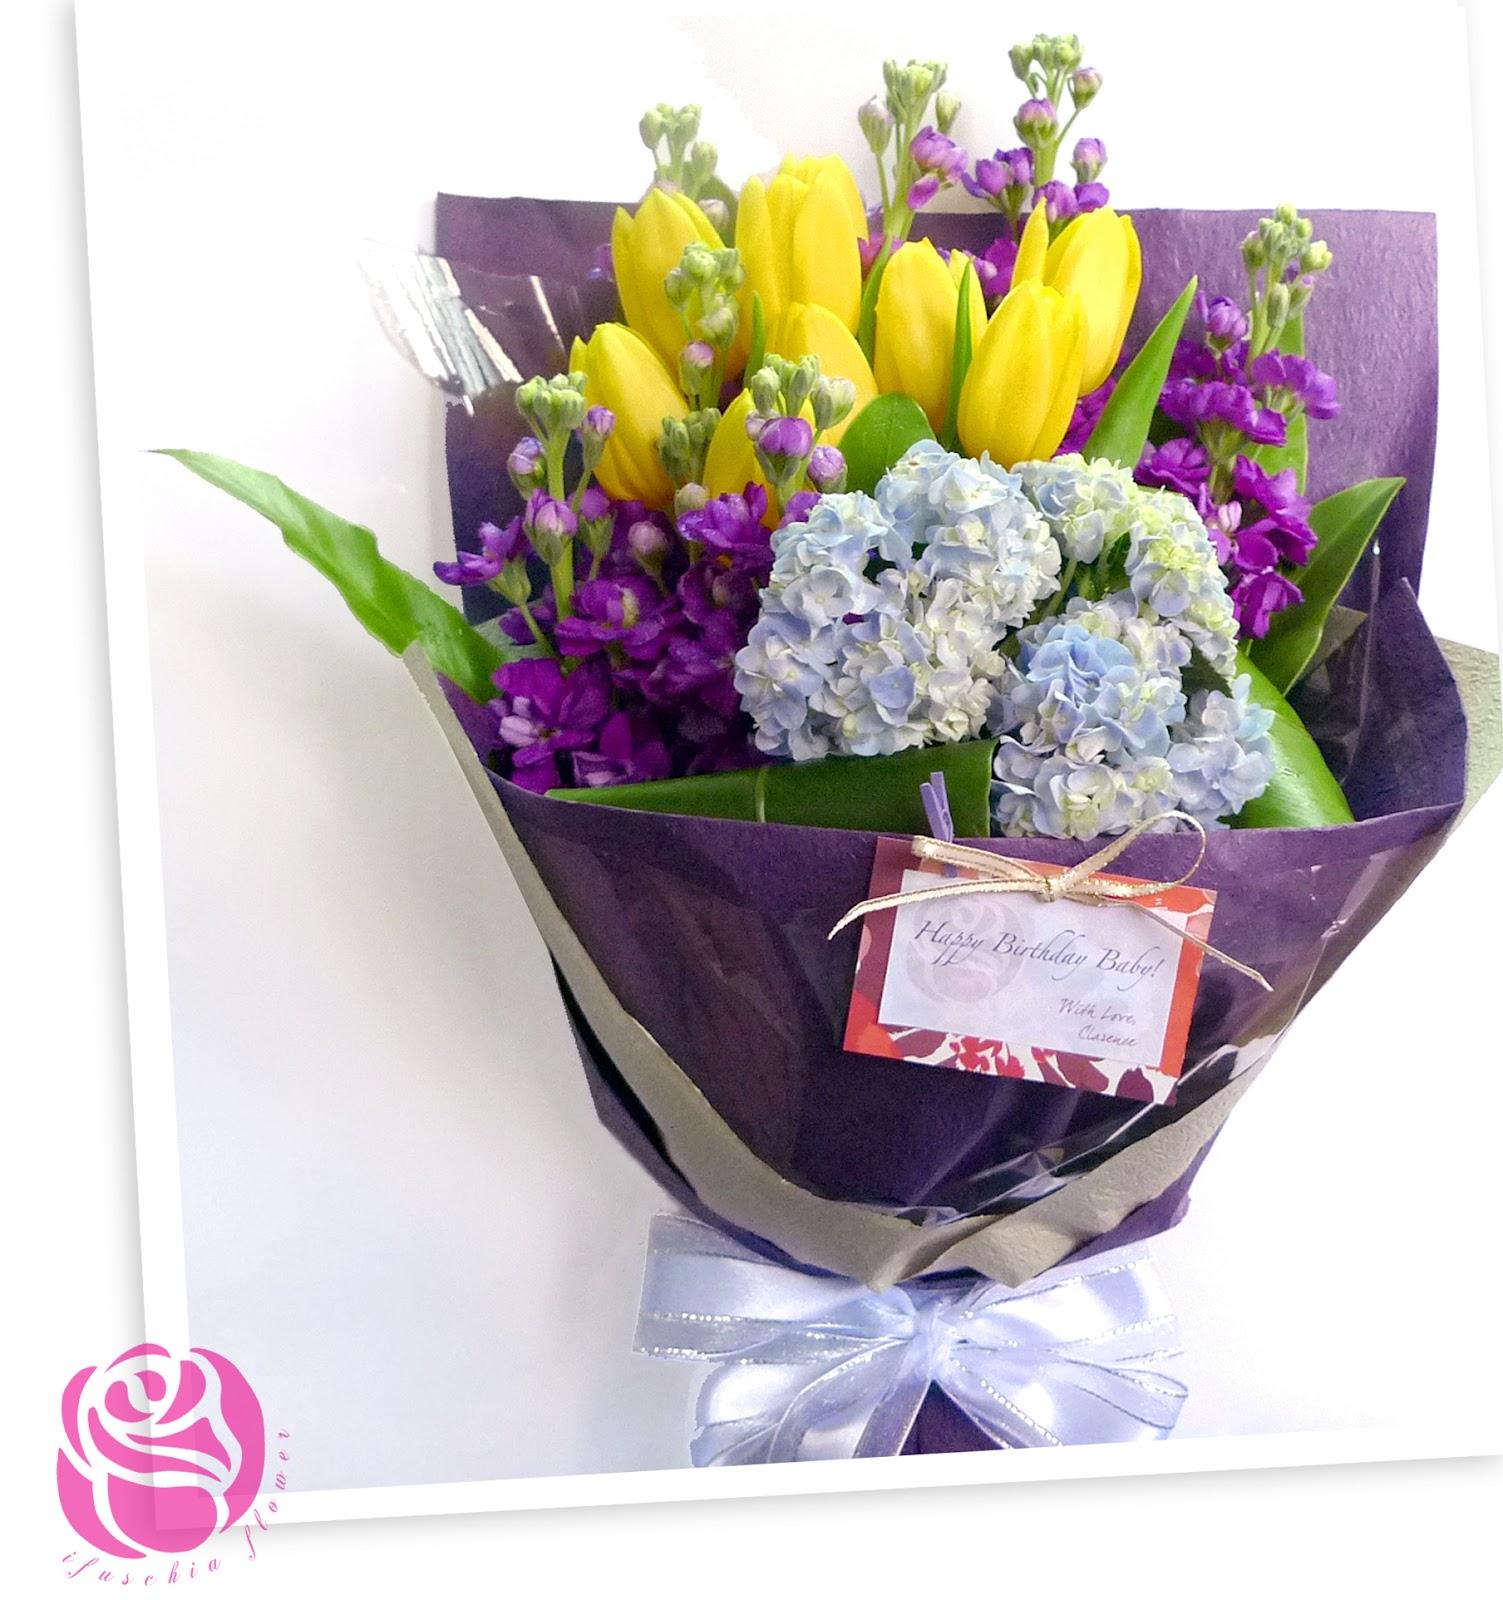 Ifuschia flower birthday bouquet of yellow tulips birthday bouquet of yellow tulips izmirmasajfo Gallery